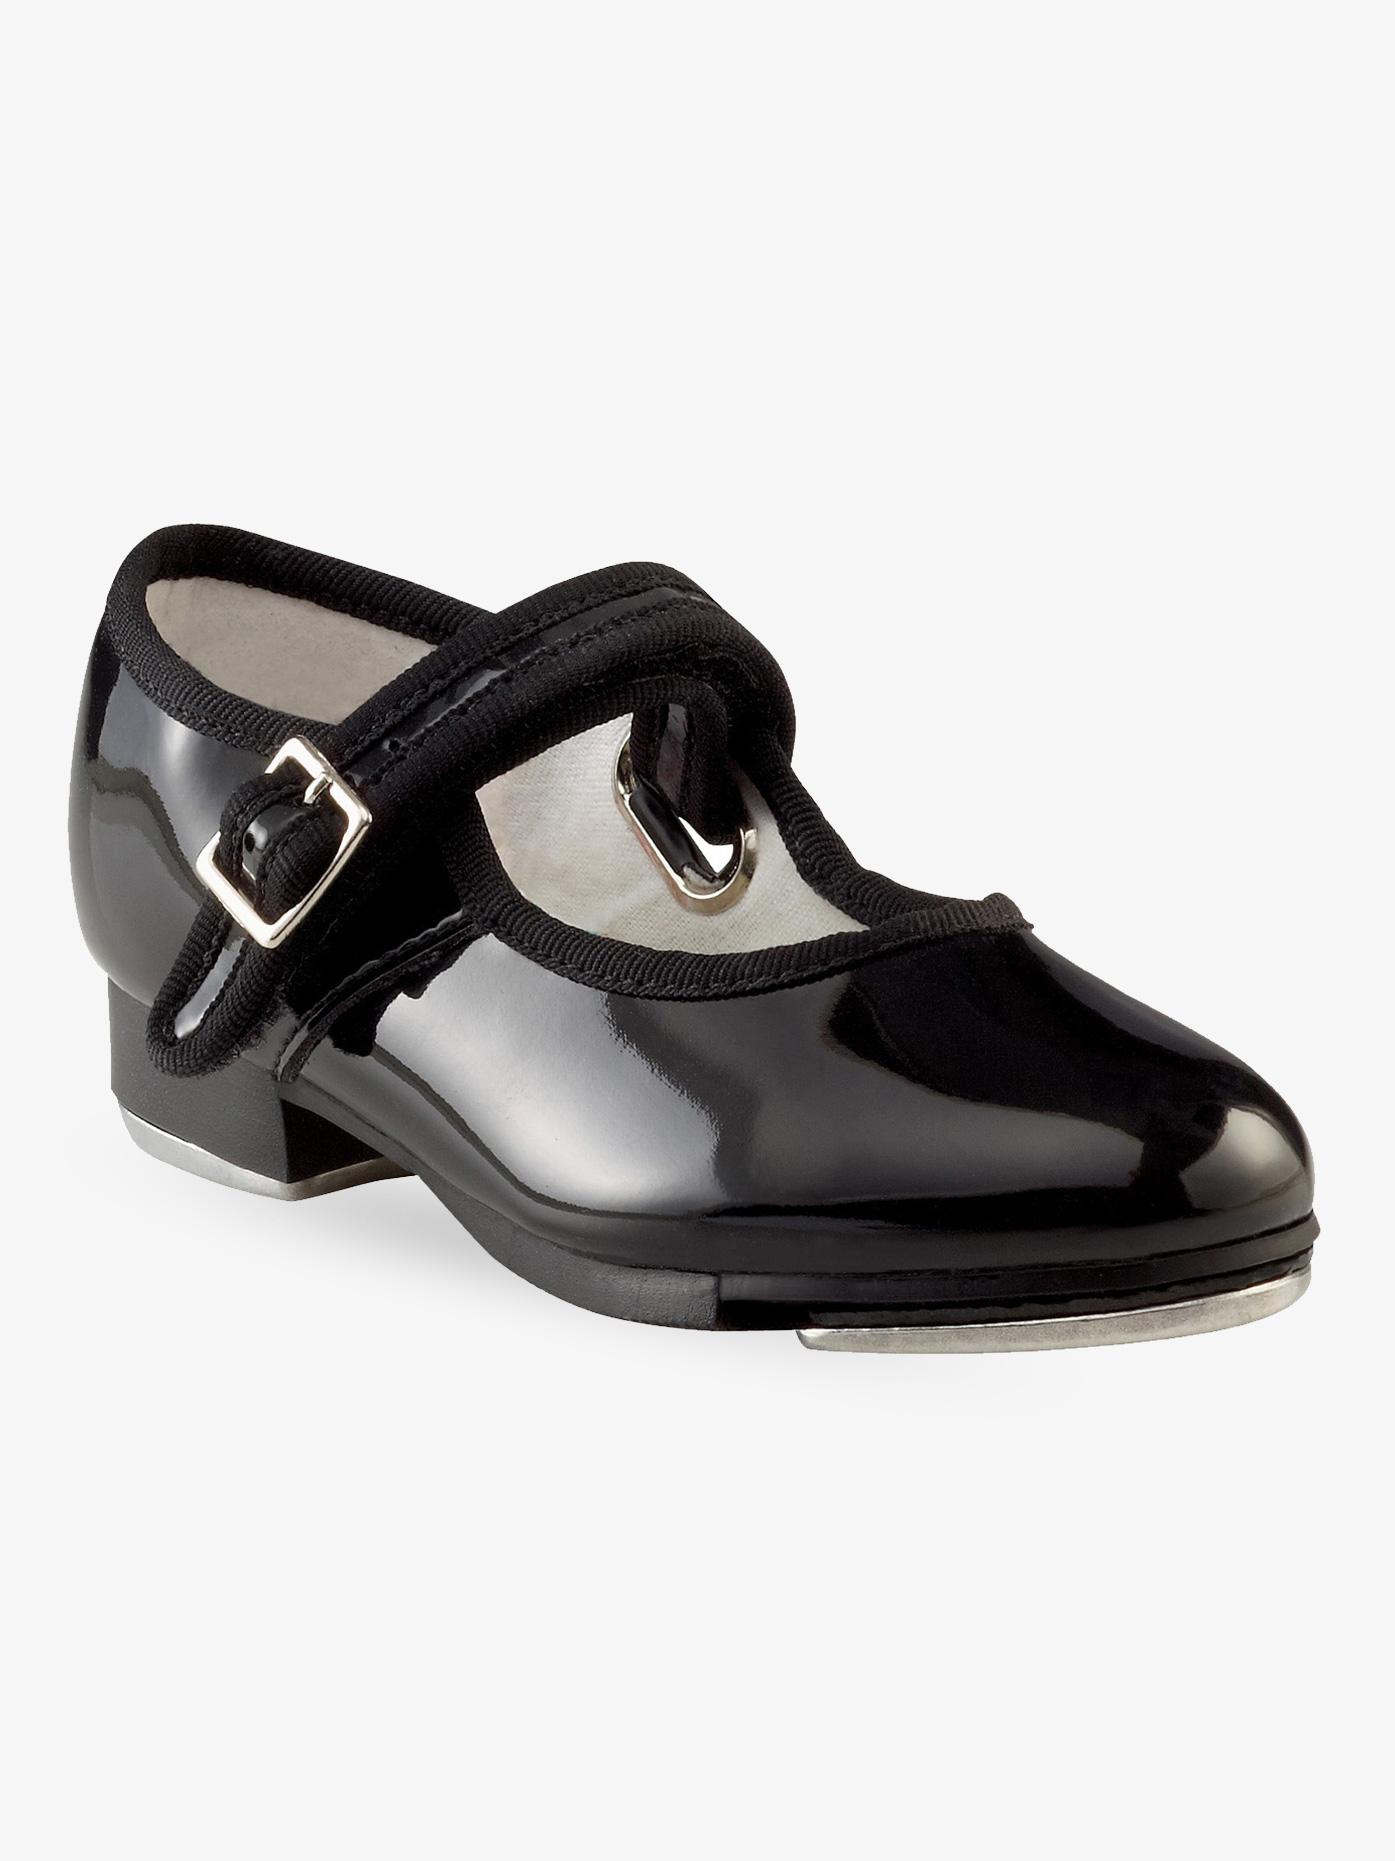 Womens Mary Jane Tap Shoe - Black, 5.5 W US Capezio